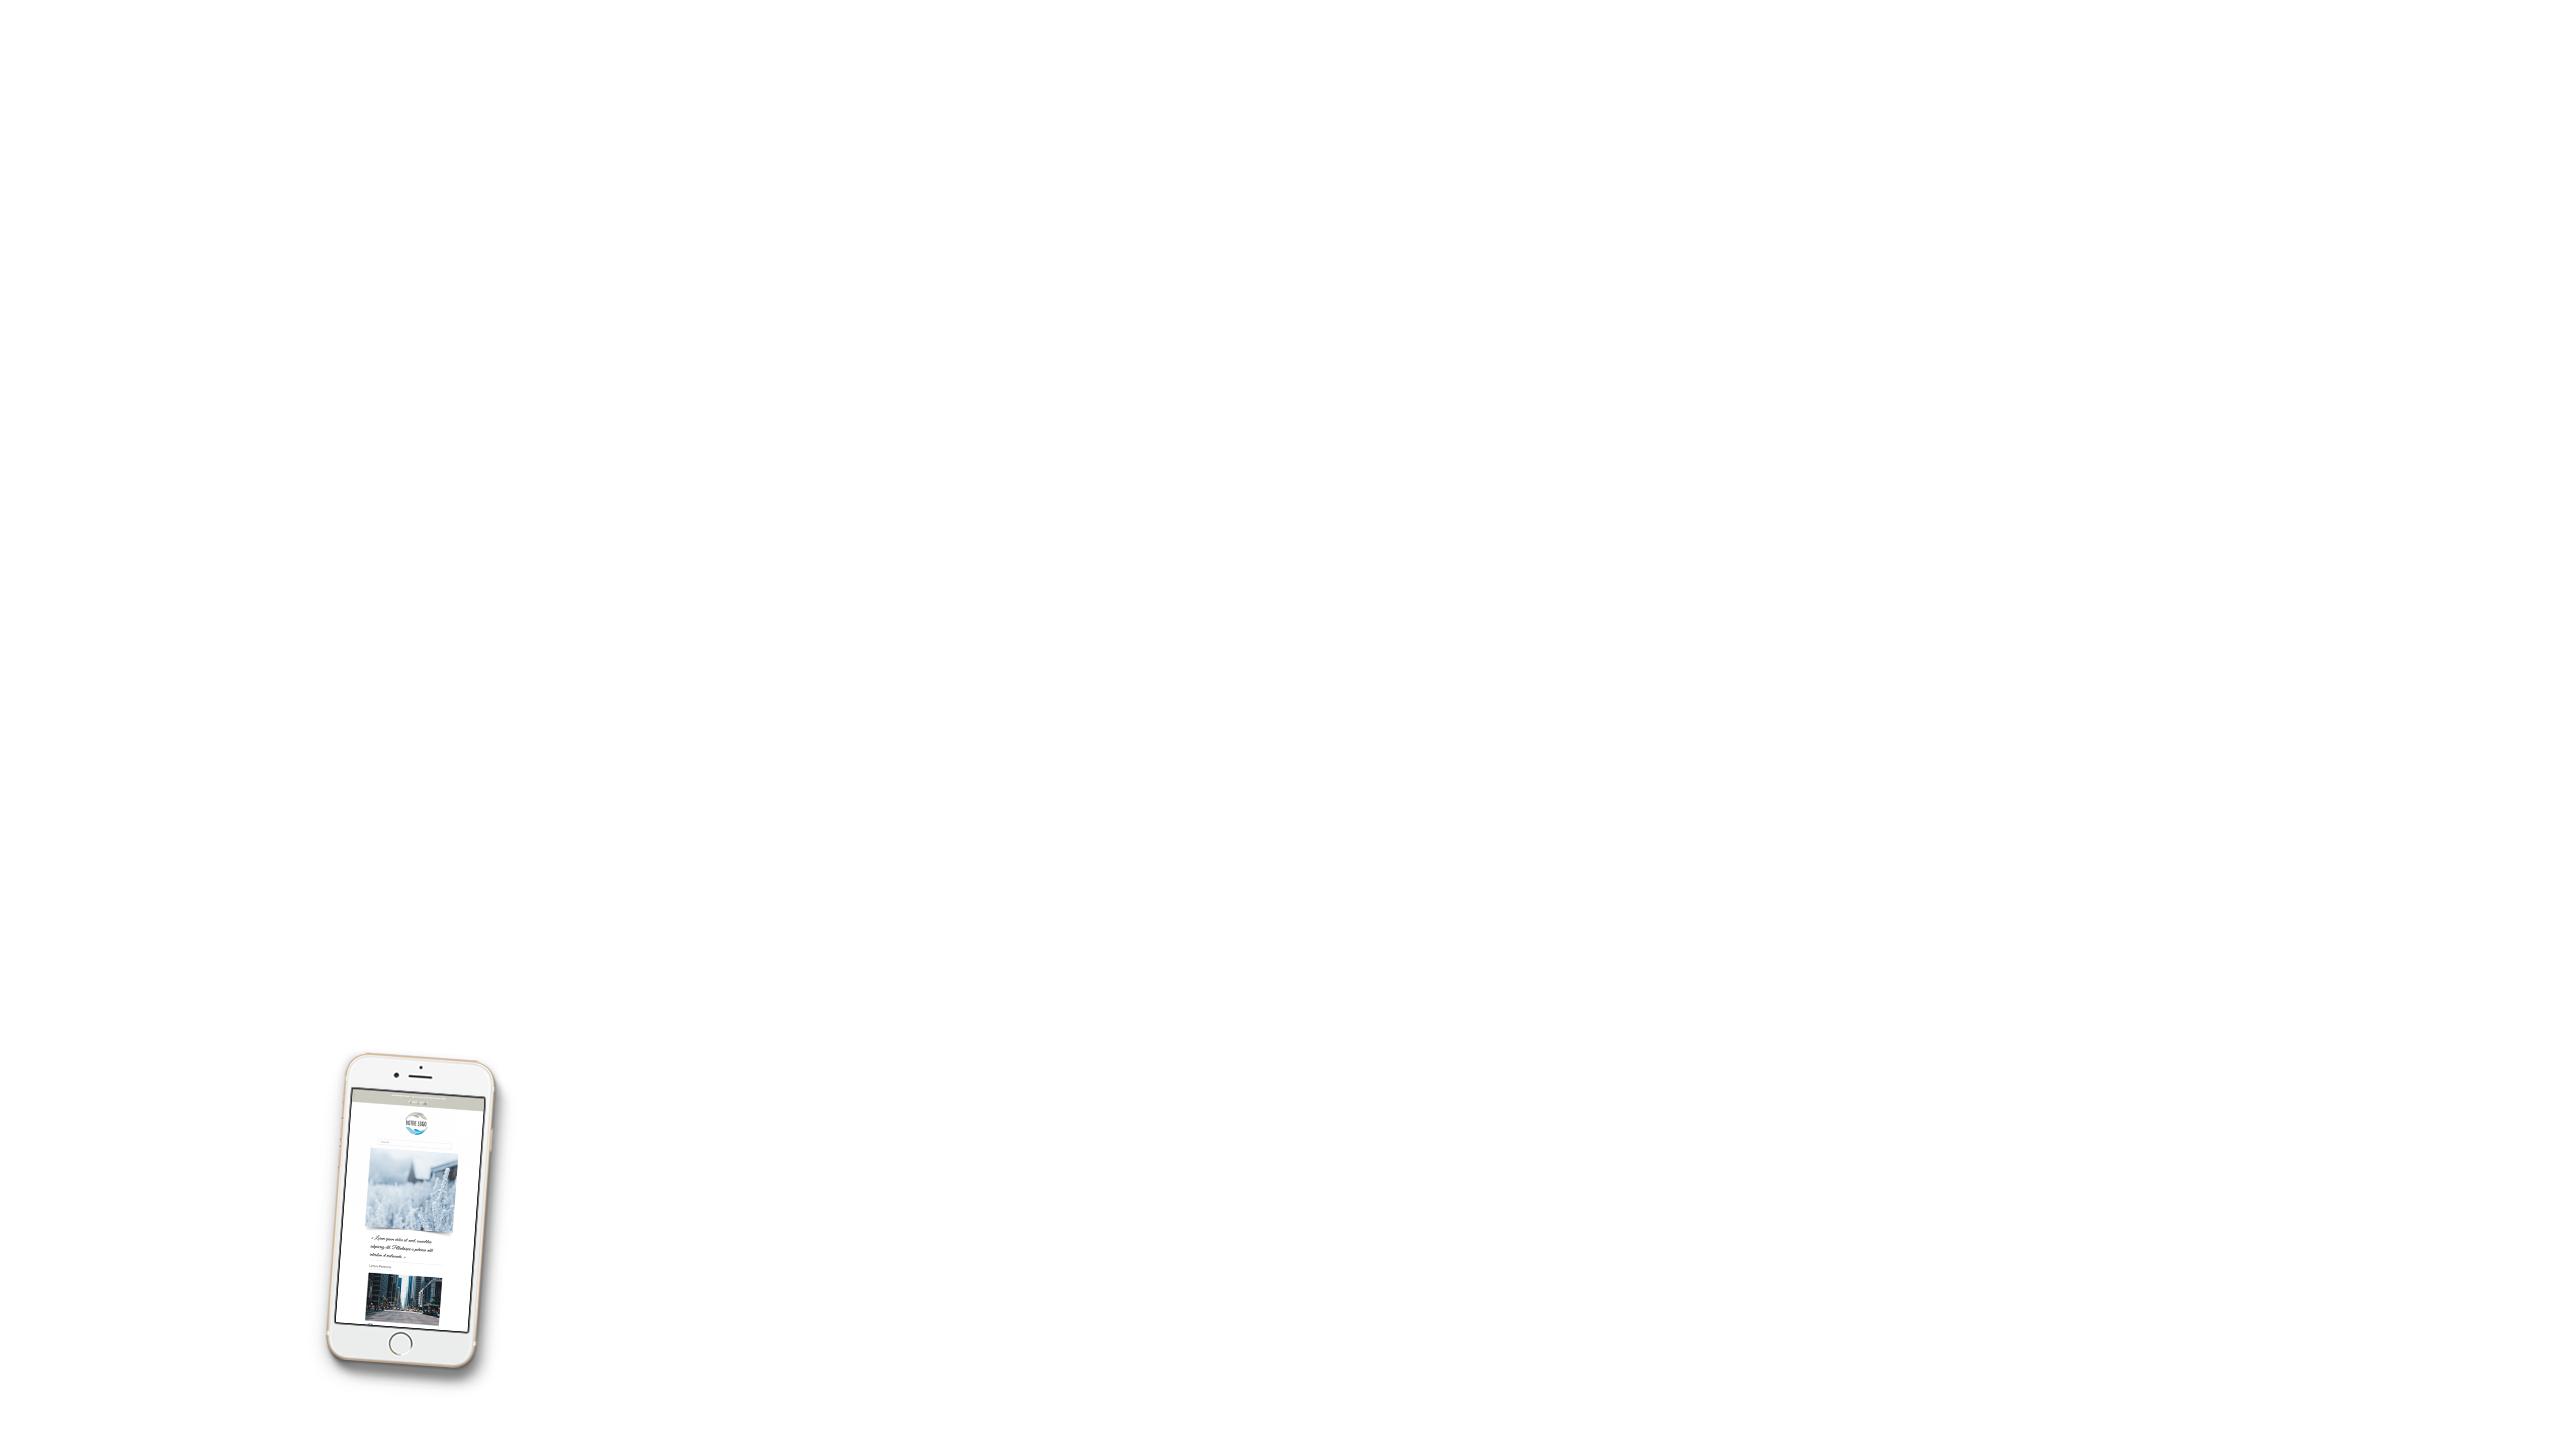 Image Blanc 2560 X 1440